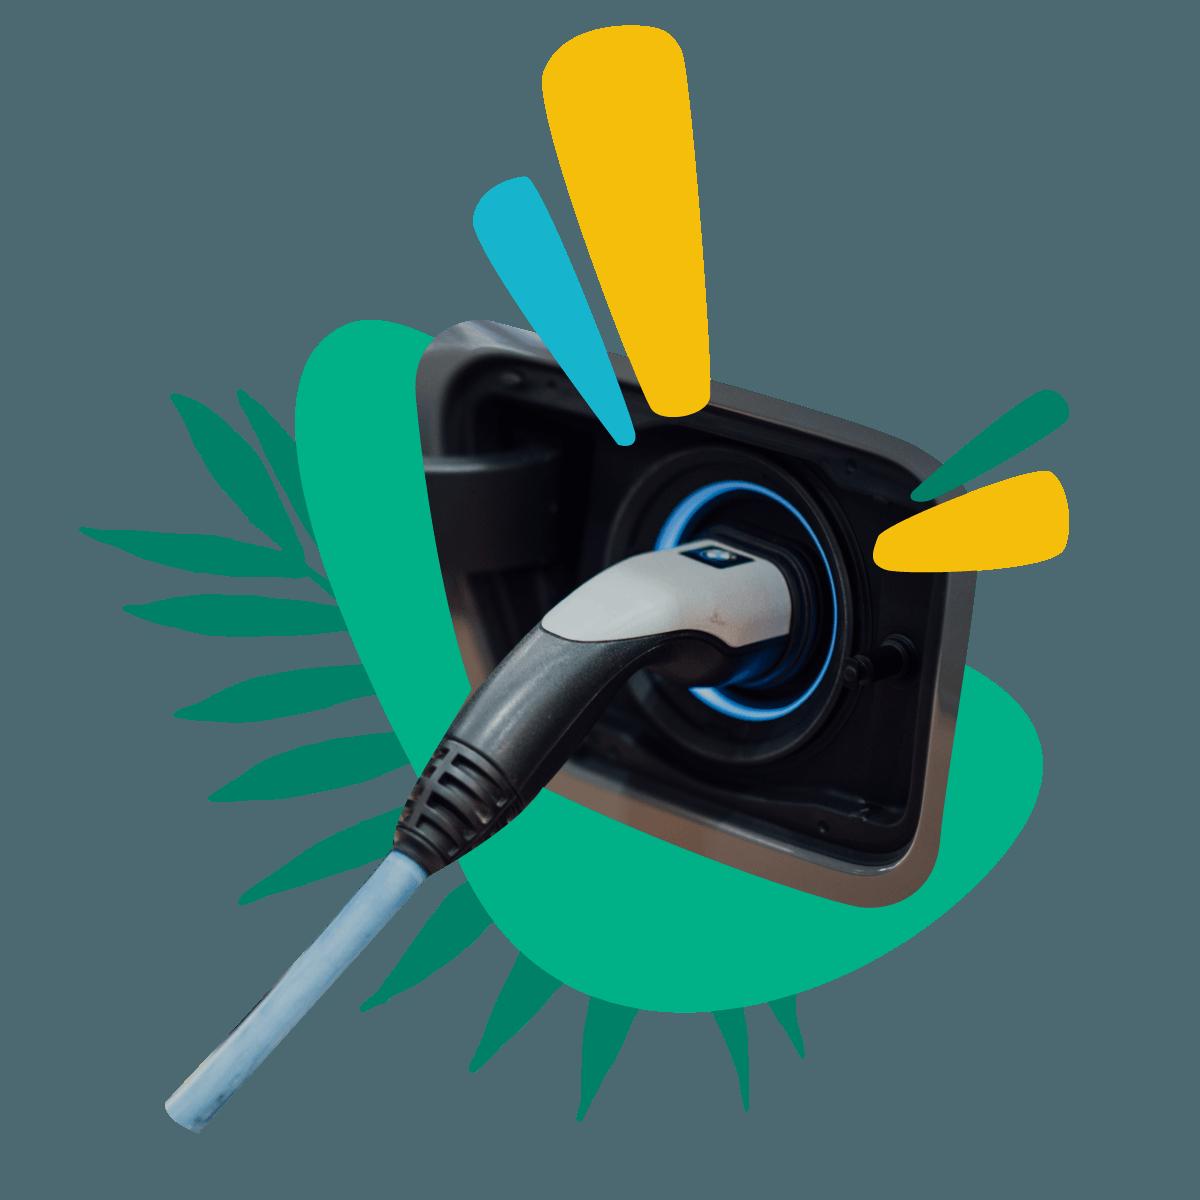 Illustration of electric vehicle charging plug